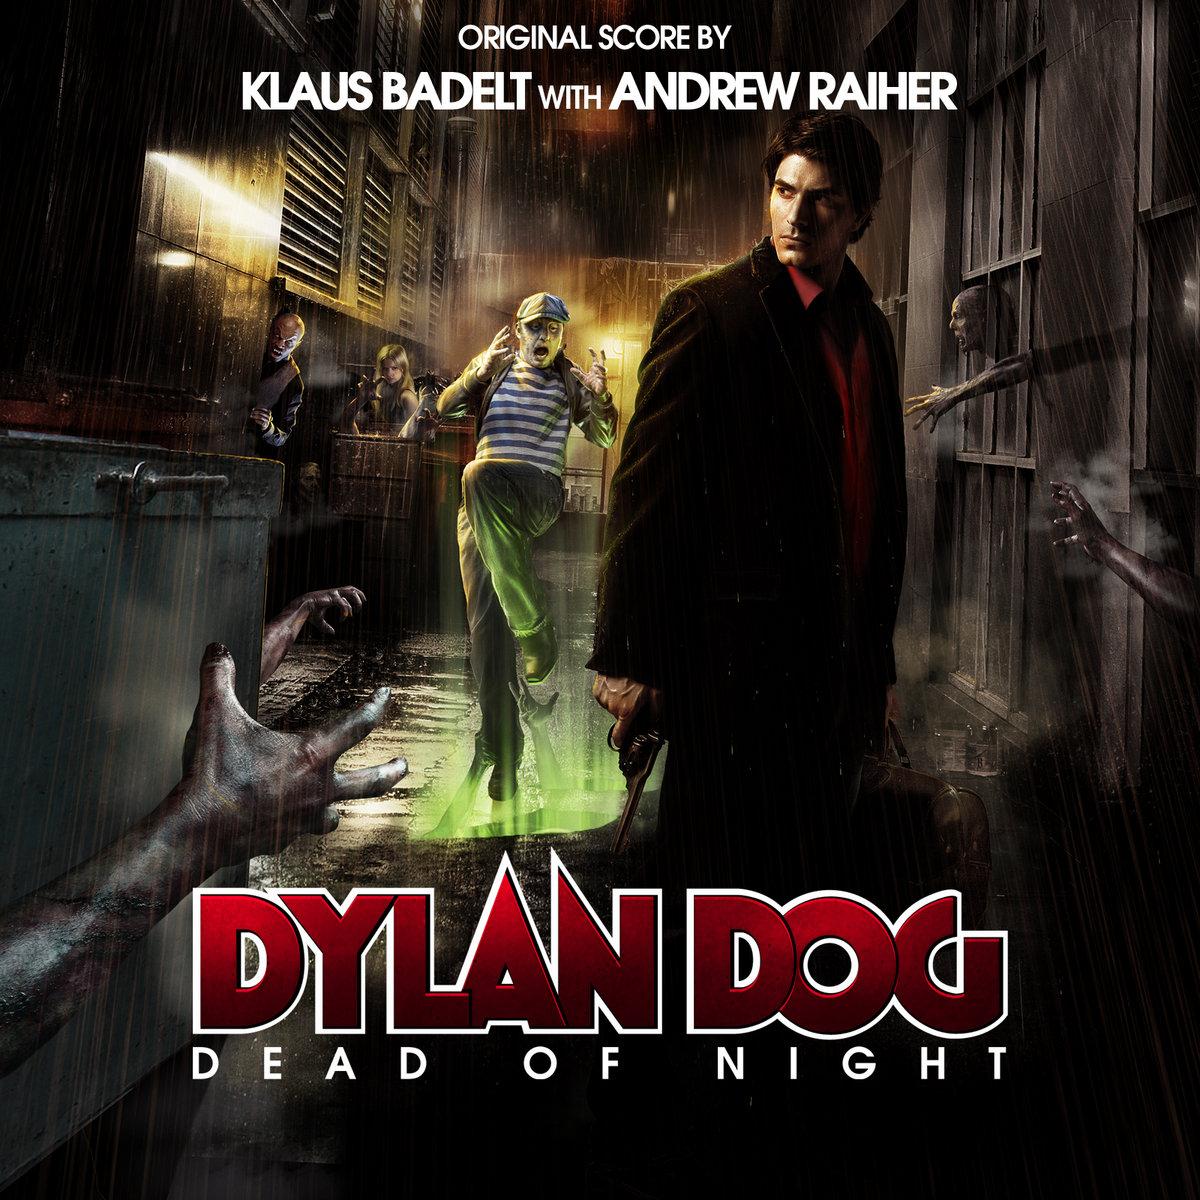 Dylan Dog Dead Of Night Full Movie